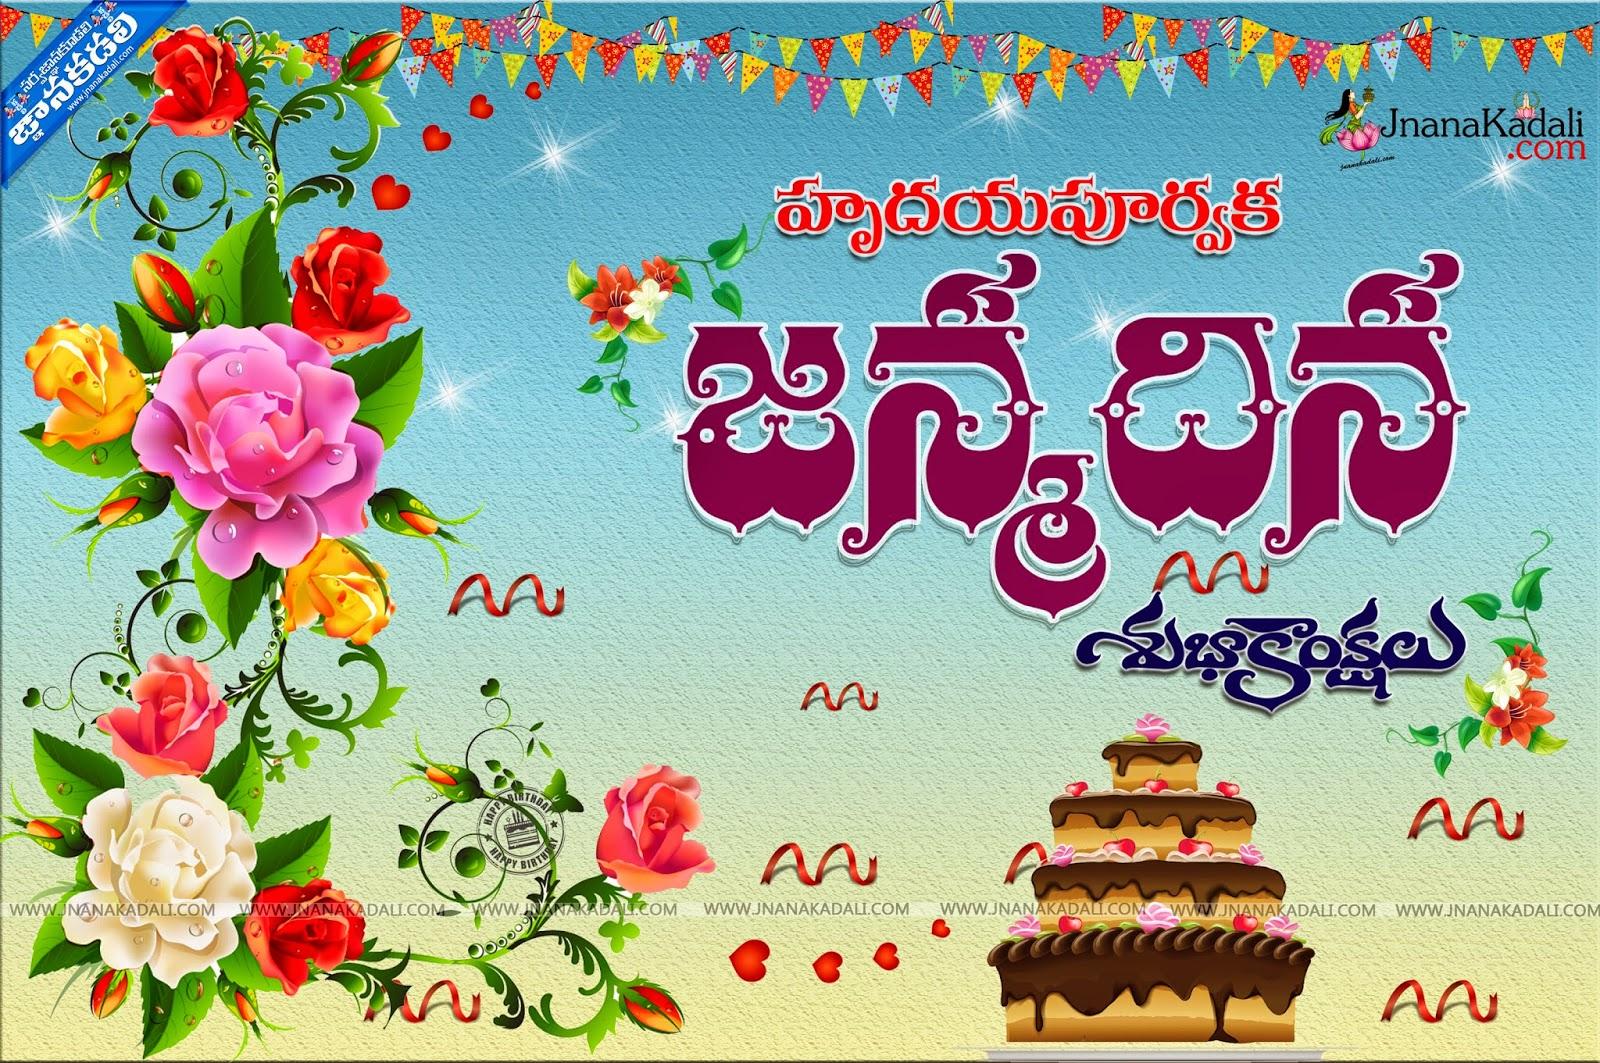 Birth Day Quotes hd wallpapers in telugu puttinaroaju – Telugu Birthday Greetings